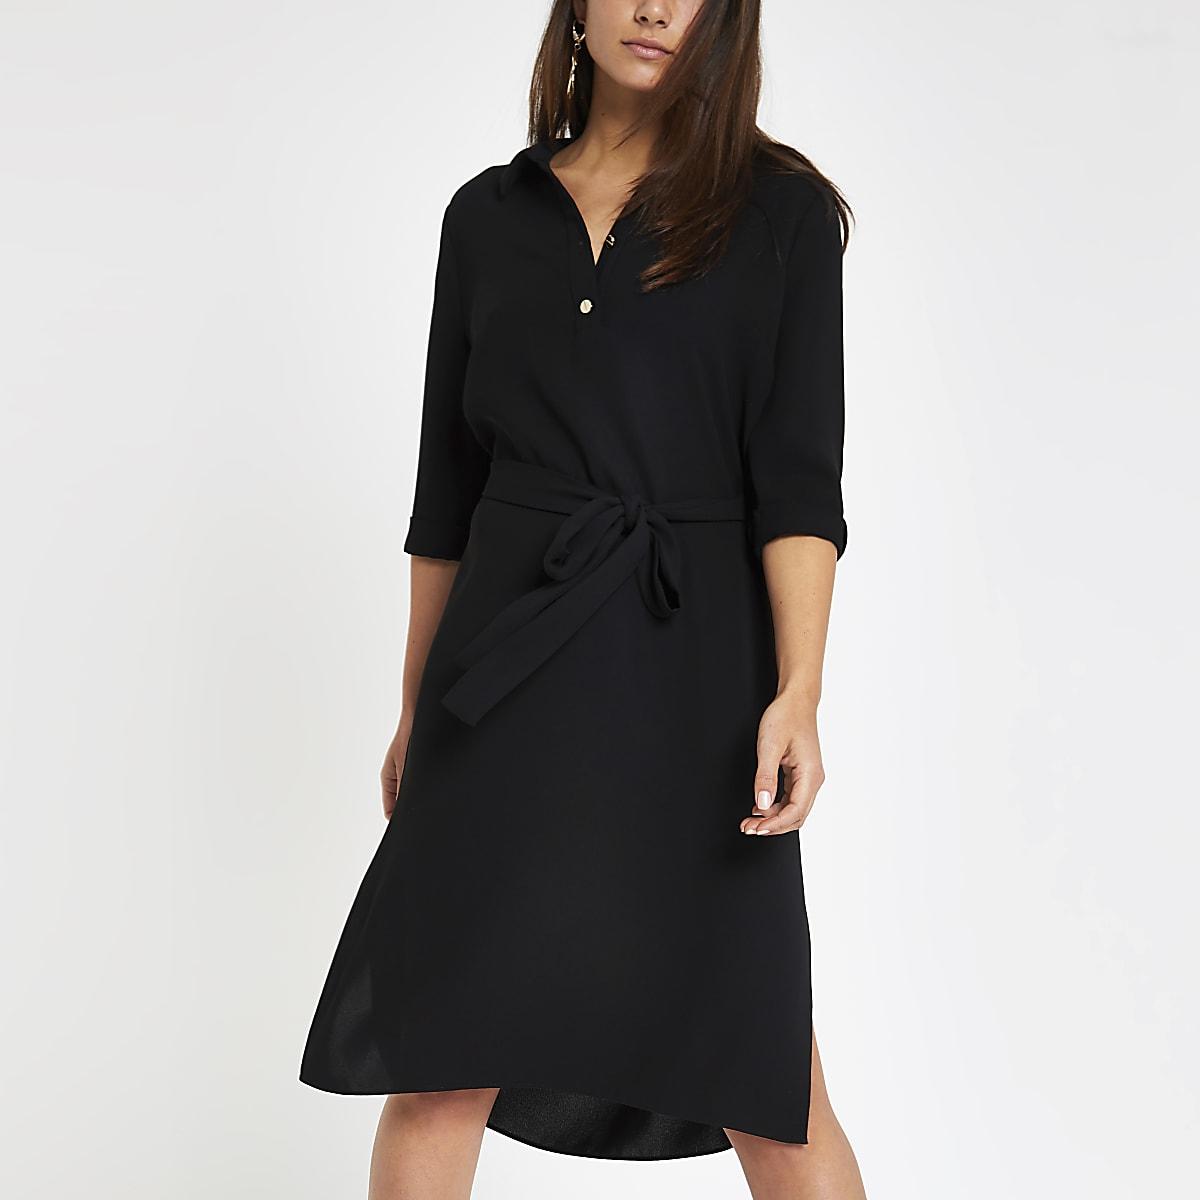 Petite black belted shirt dress